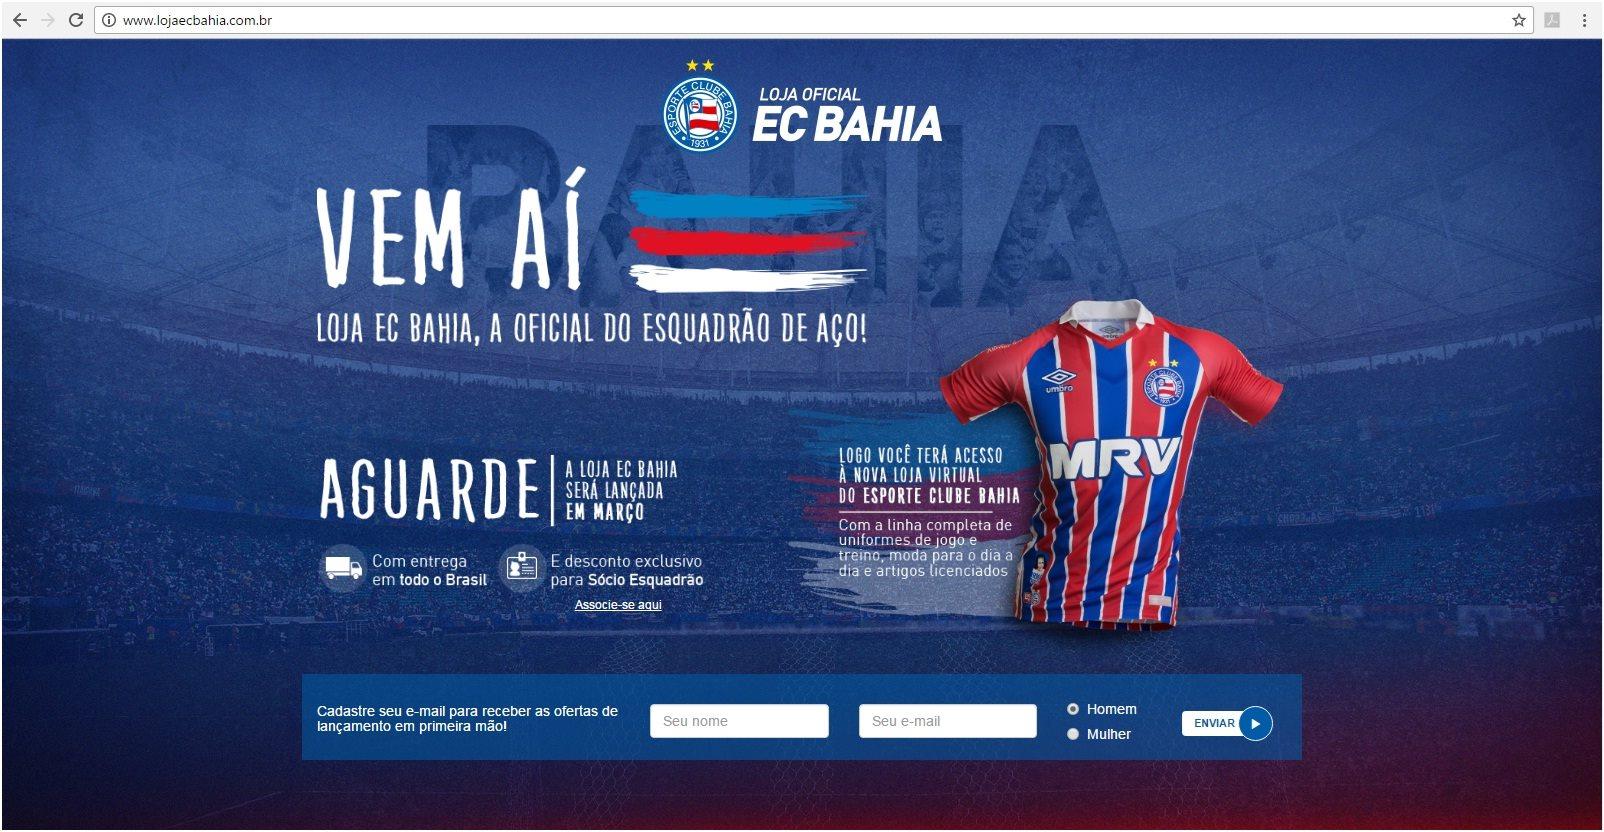 fd4fcf99519 Esporte Clube Bahia lança loja virtual EC Bahia